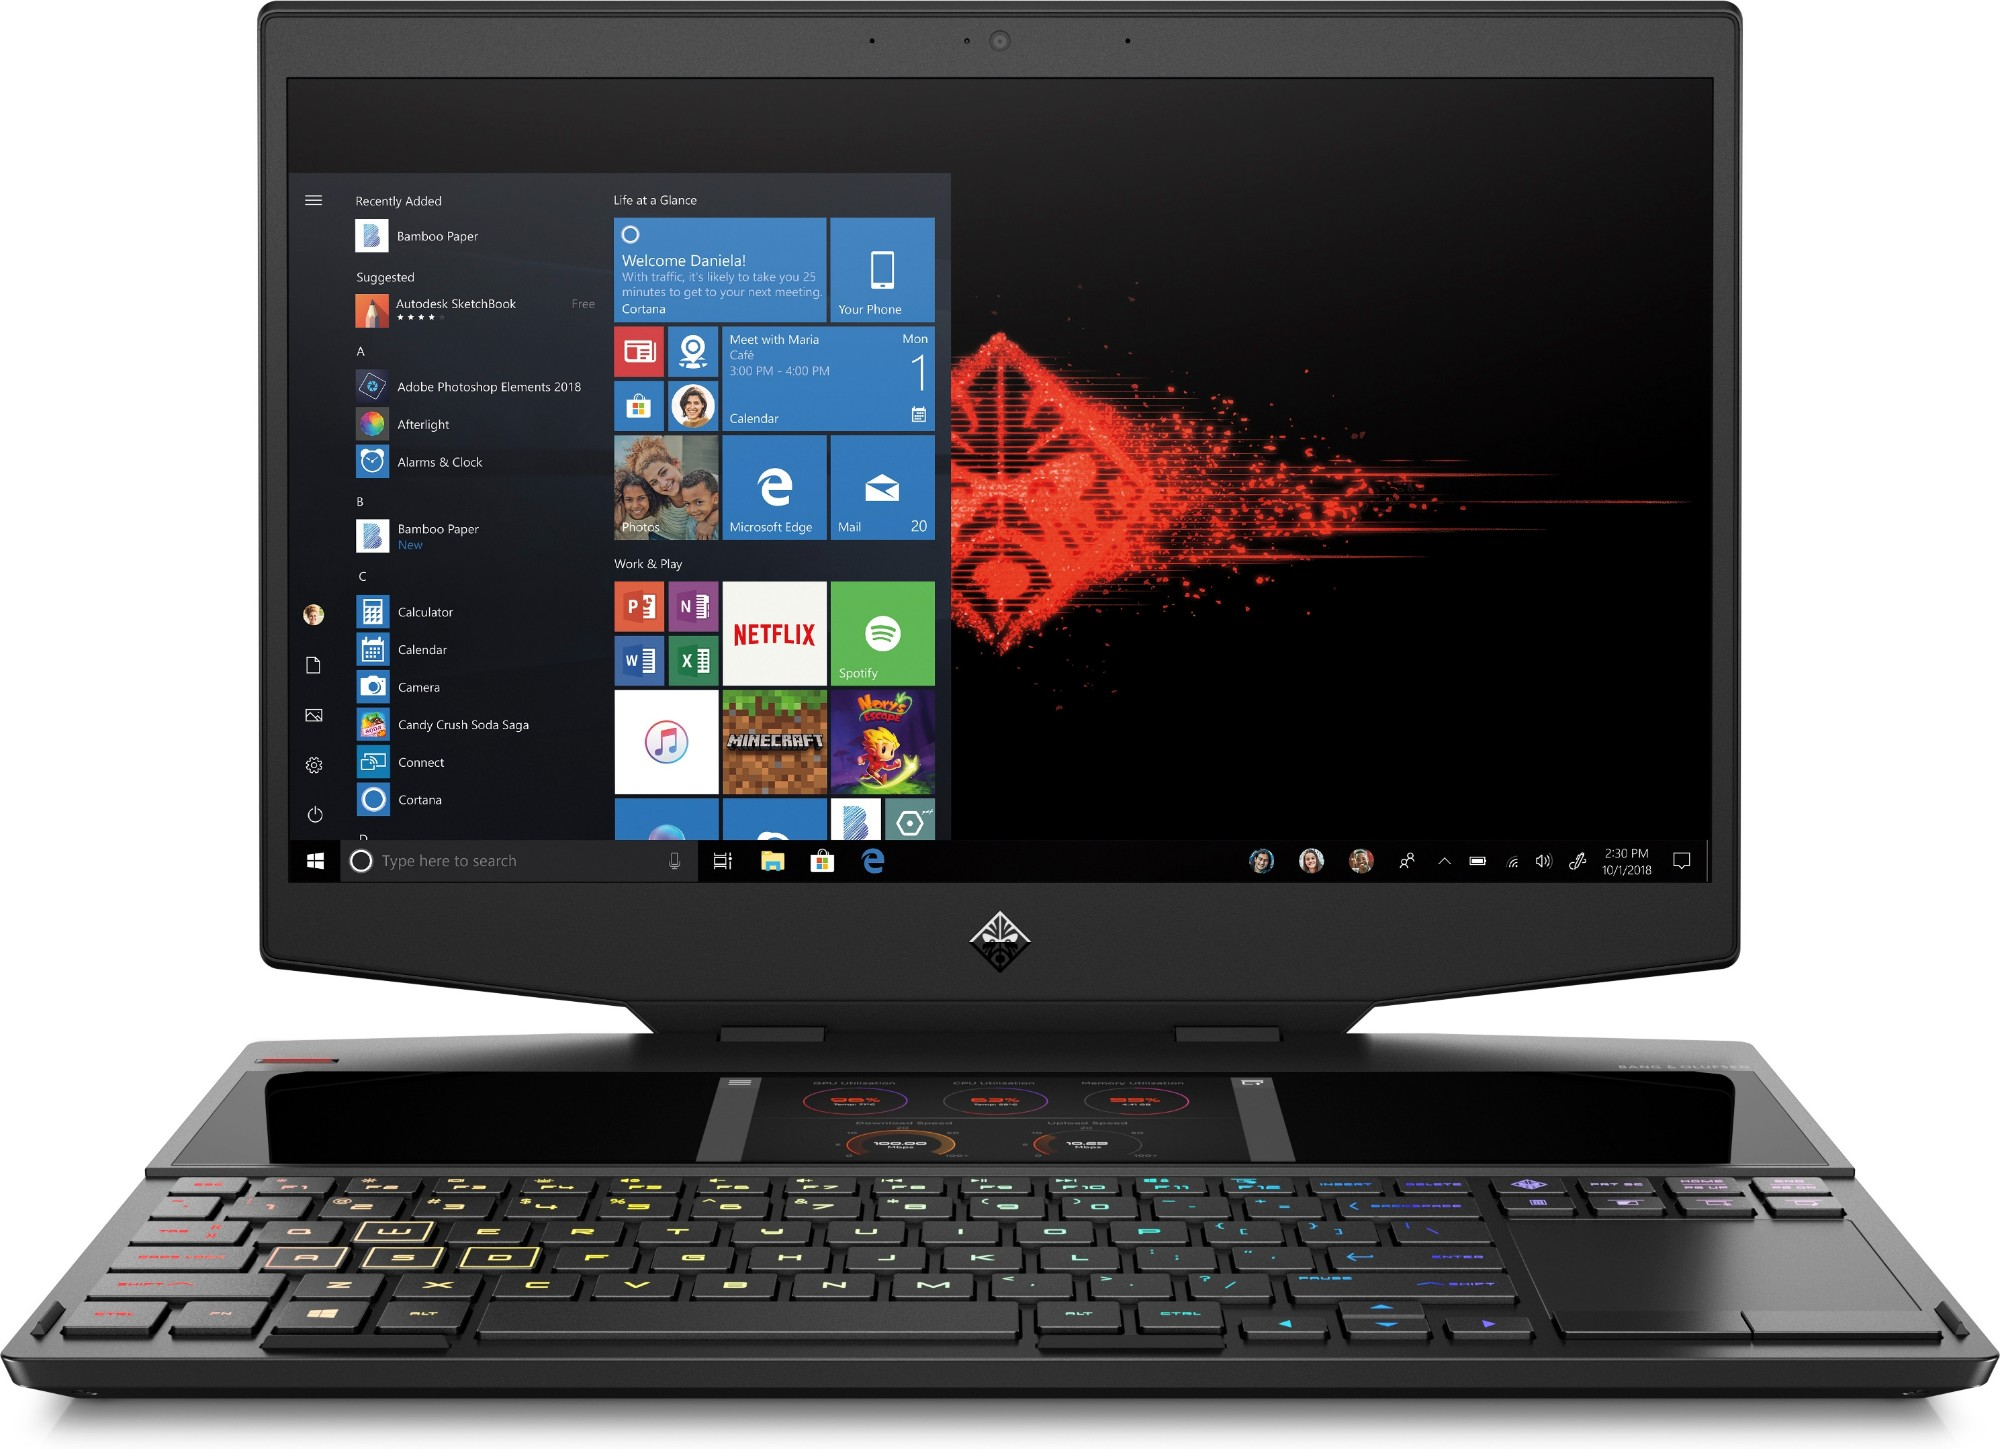 OMEN X by HP 15-dg0001na - 15.6in - i7 9750H - 16GB RAM - 512GB SSD - Win10 Home